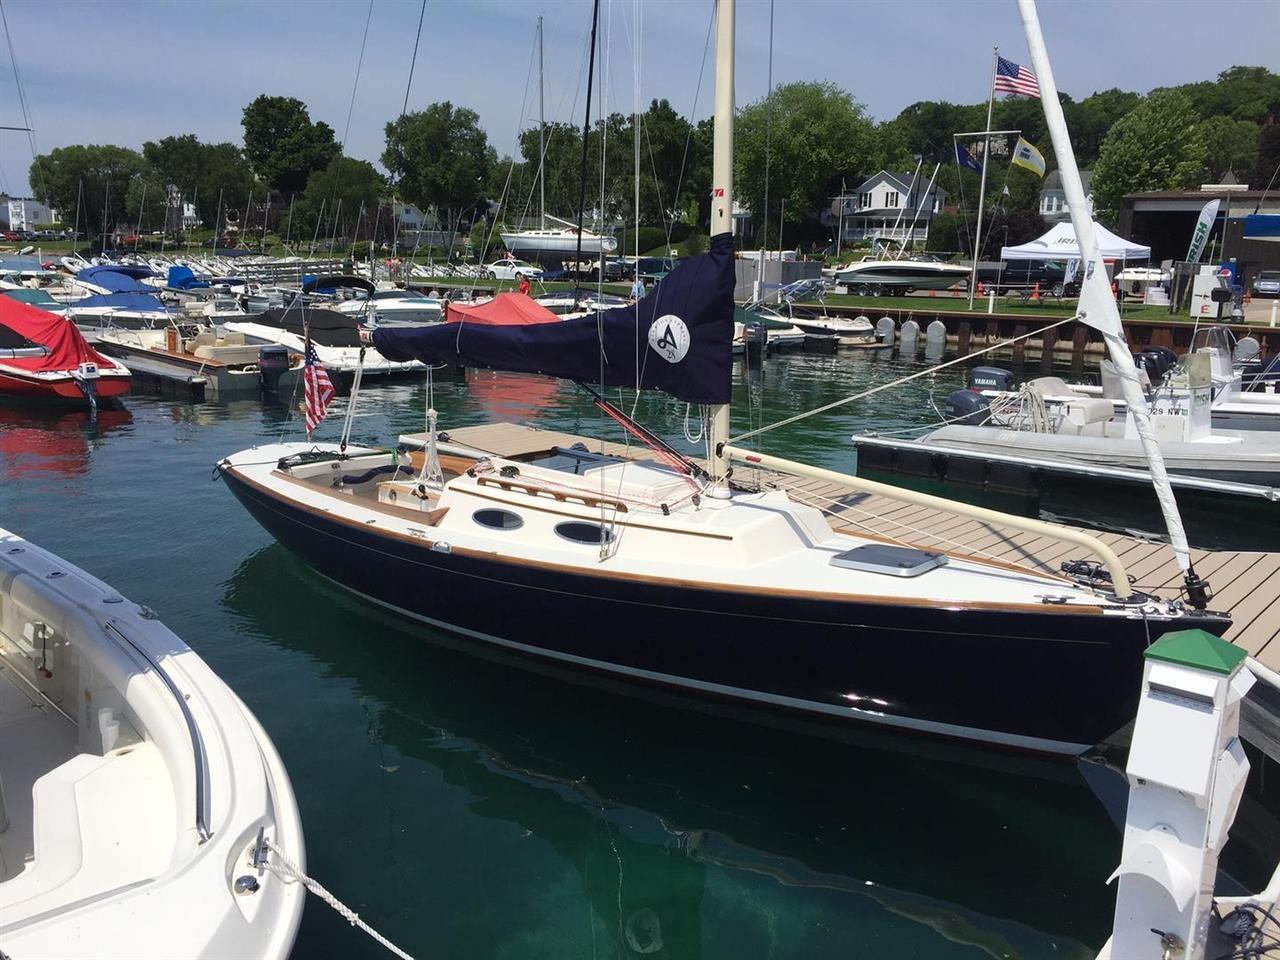 2016 Used Alerion Express 28 Daysailer Sailboat For Sale - $149,900